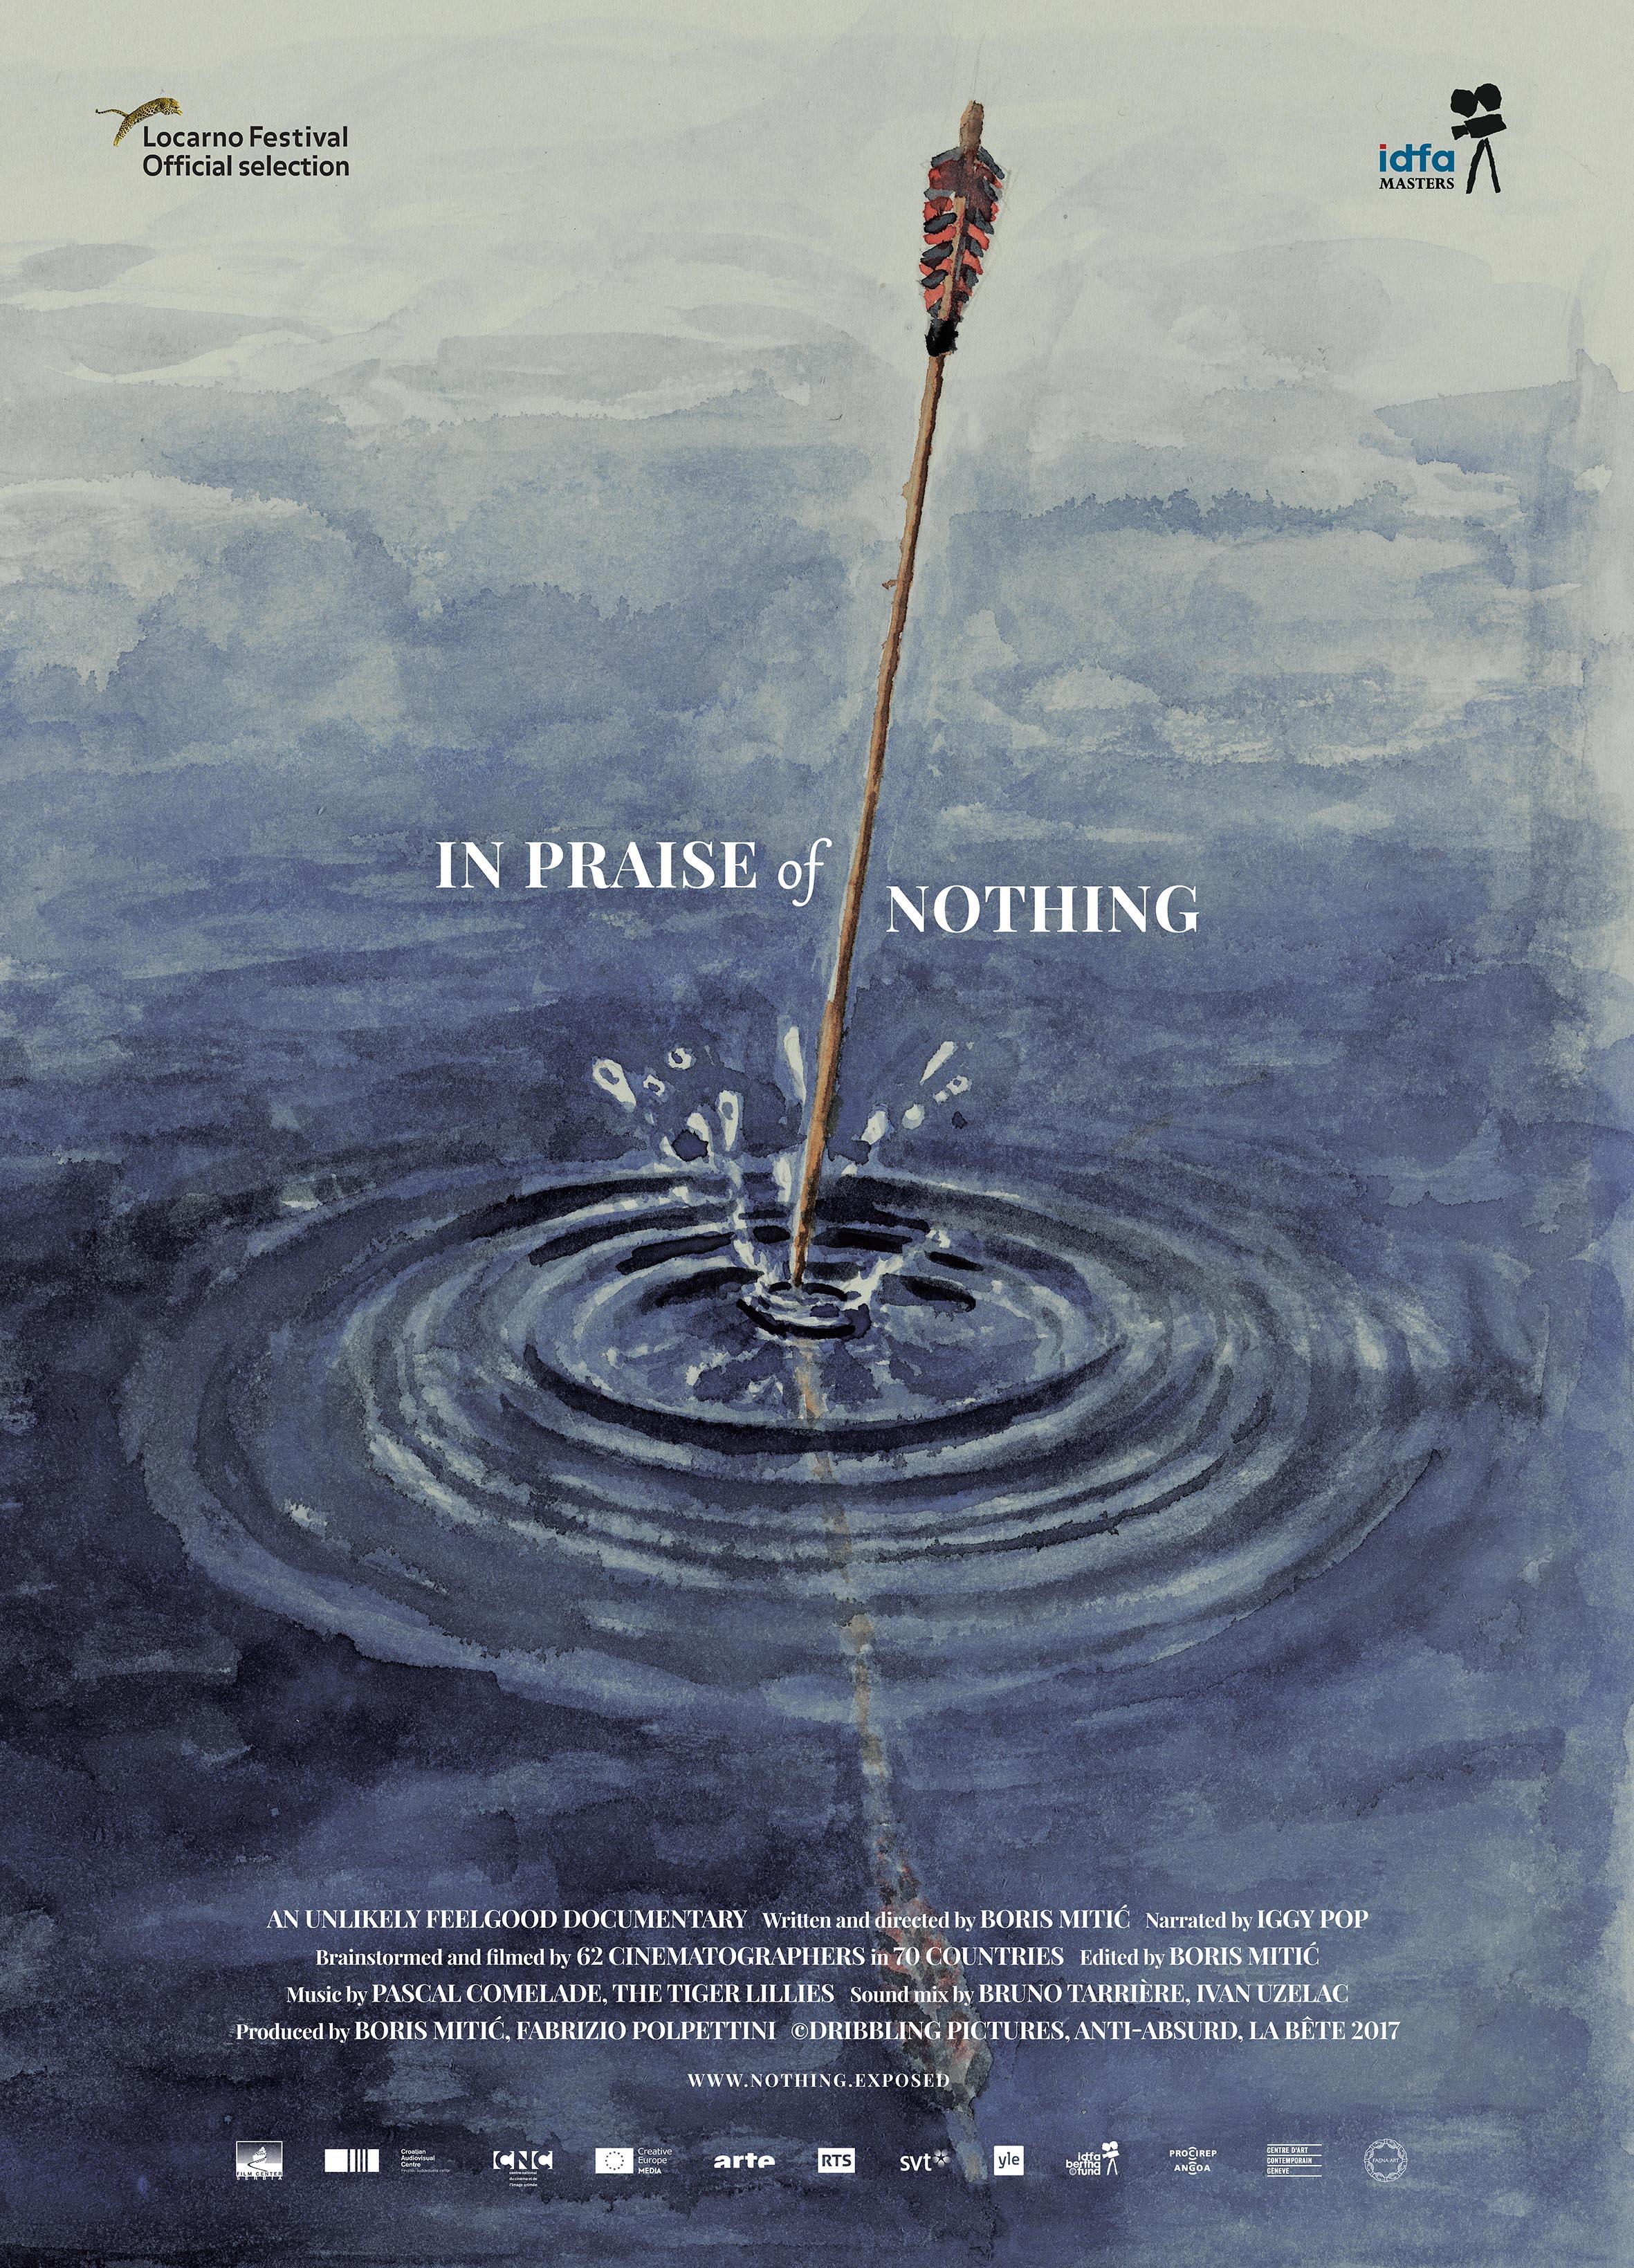 In Praise of Nothing (2017) IMDb